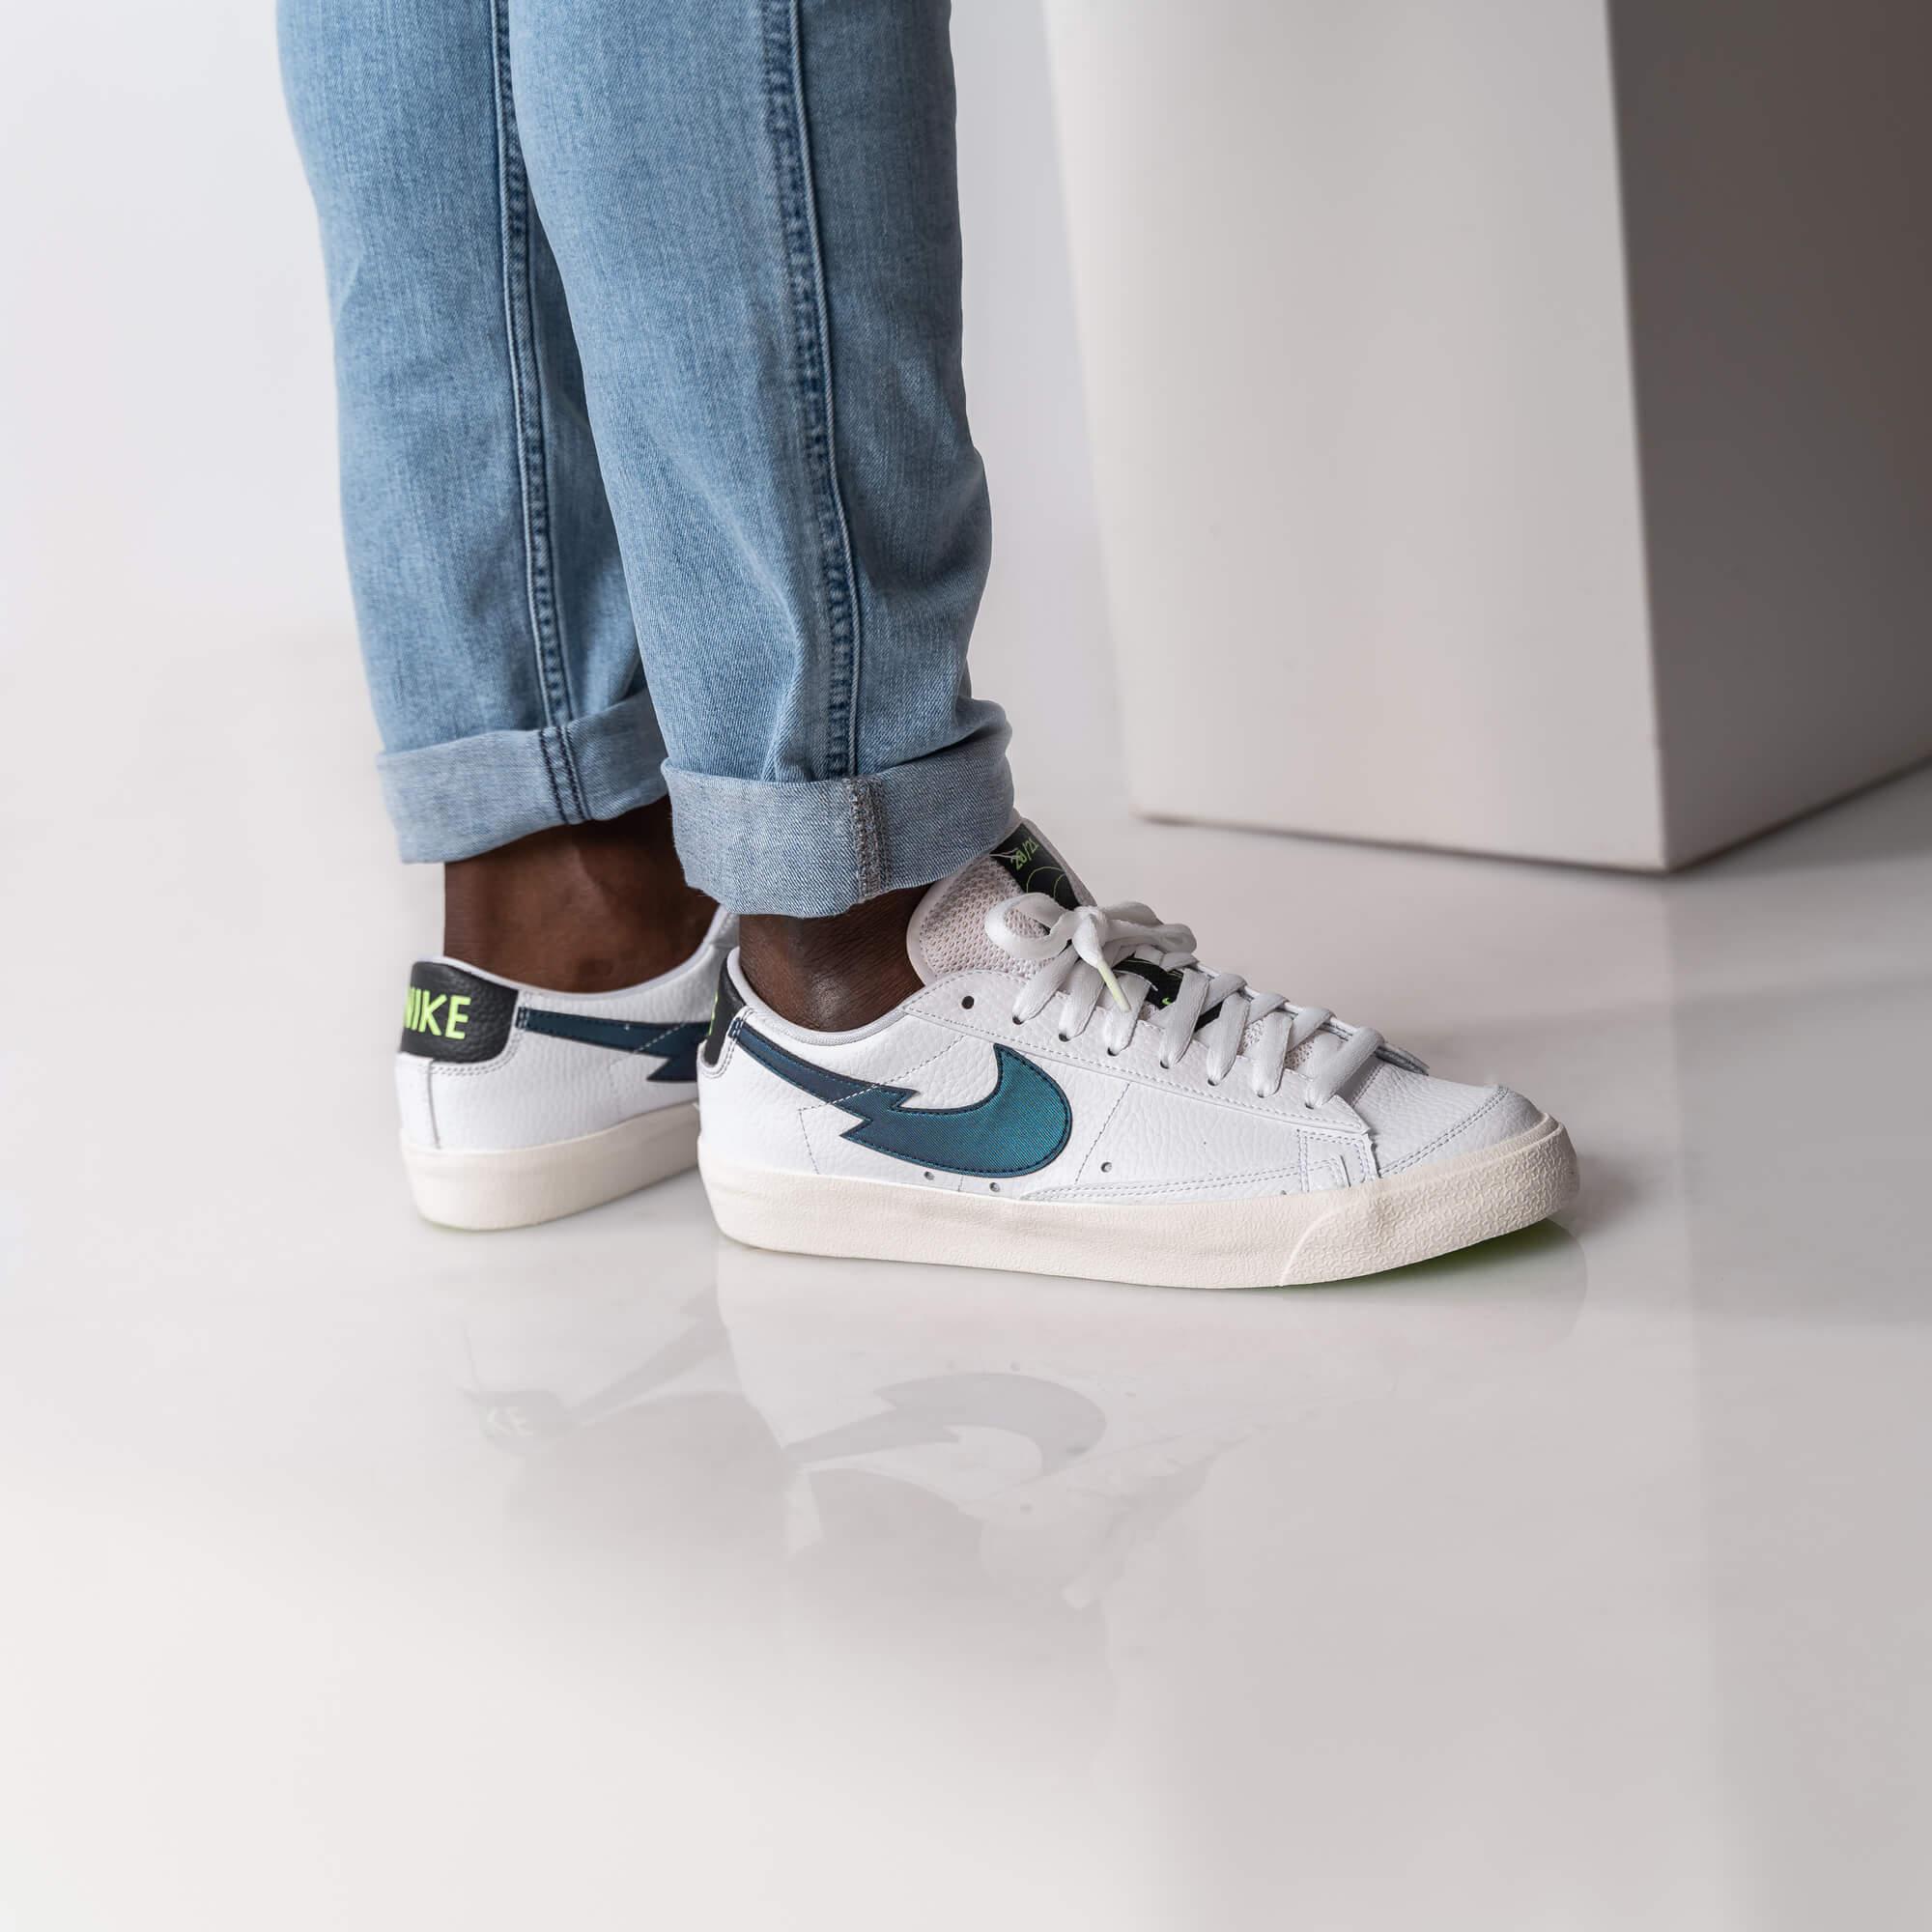 "on feet photo 2: Nike Blazer Low - ""Lightning Bolt Swoosh"" - white/aquamarine/lime glow/off noir - DJ6895-100 zick zack swoosh"